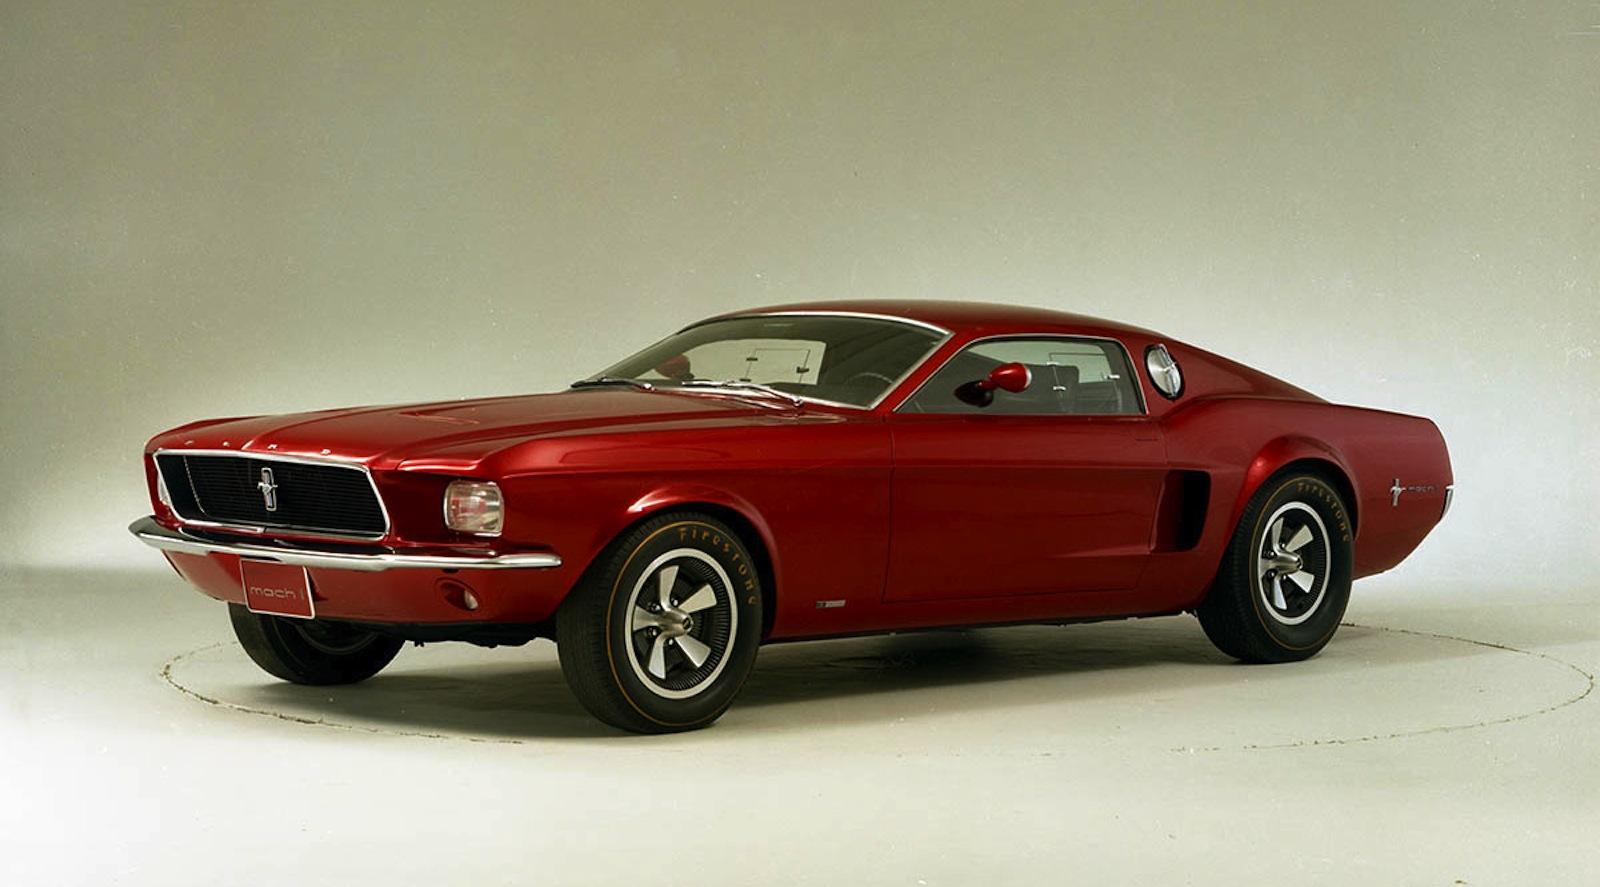 Mustang mach 1 concept